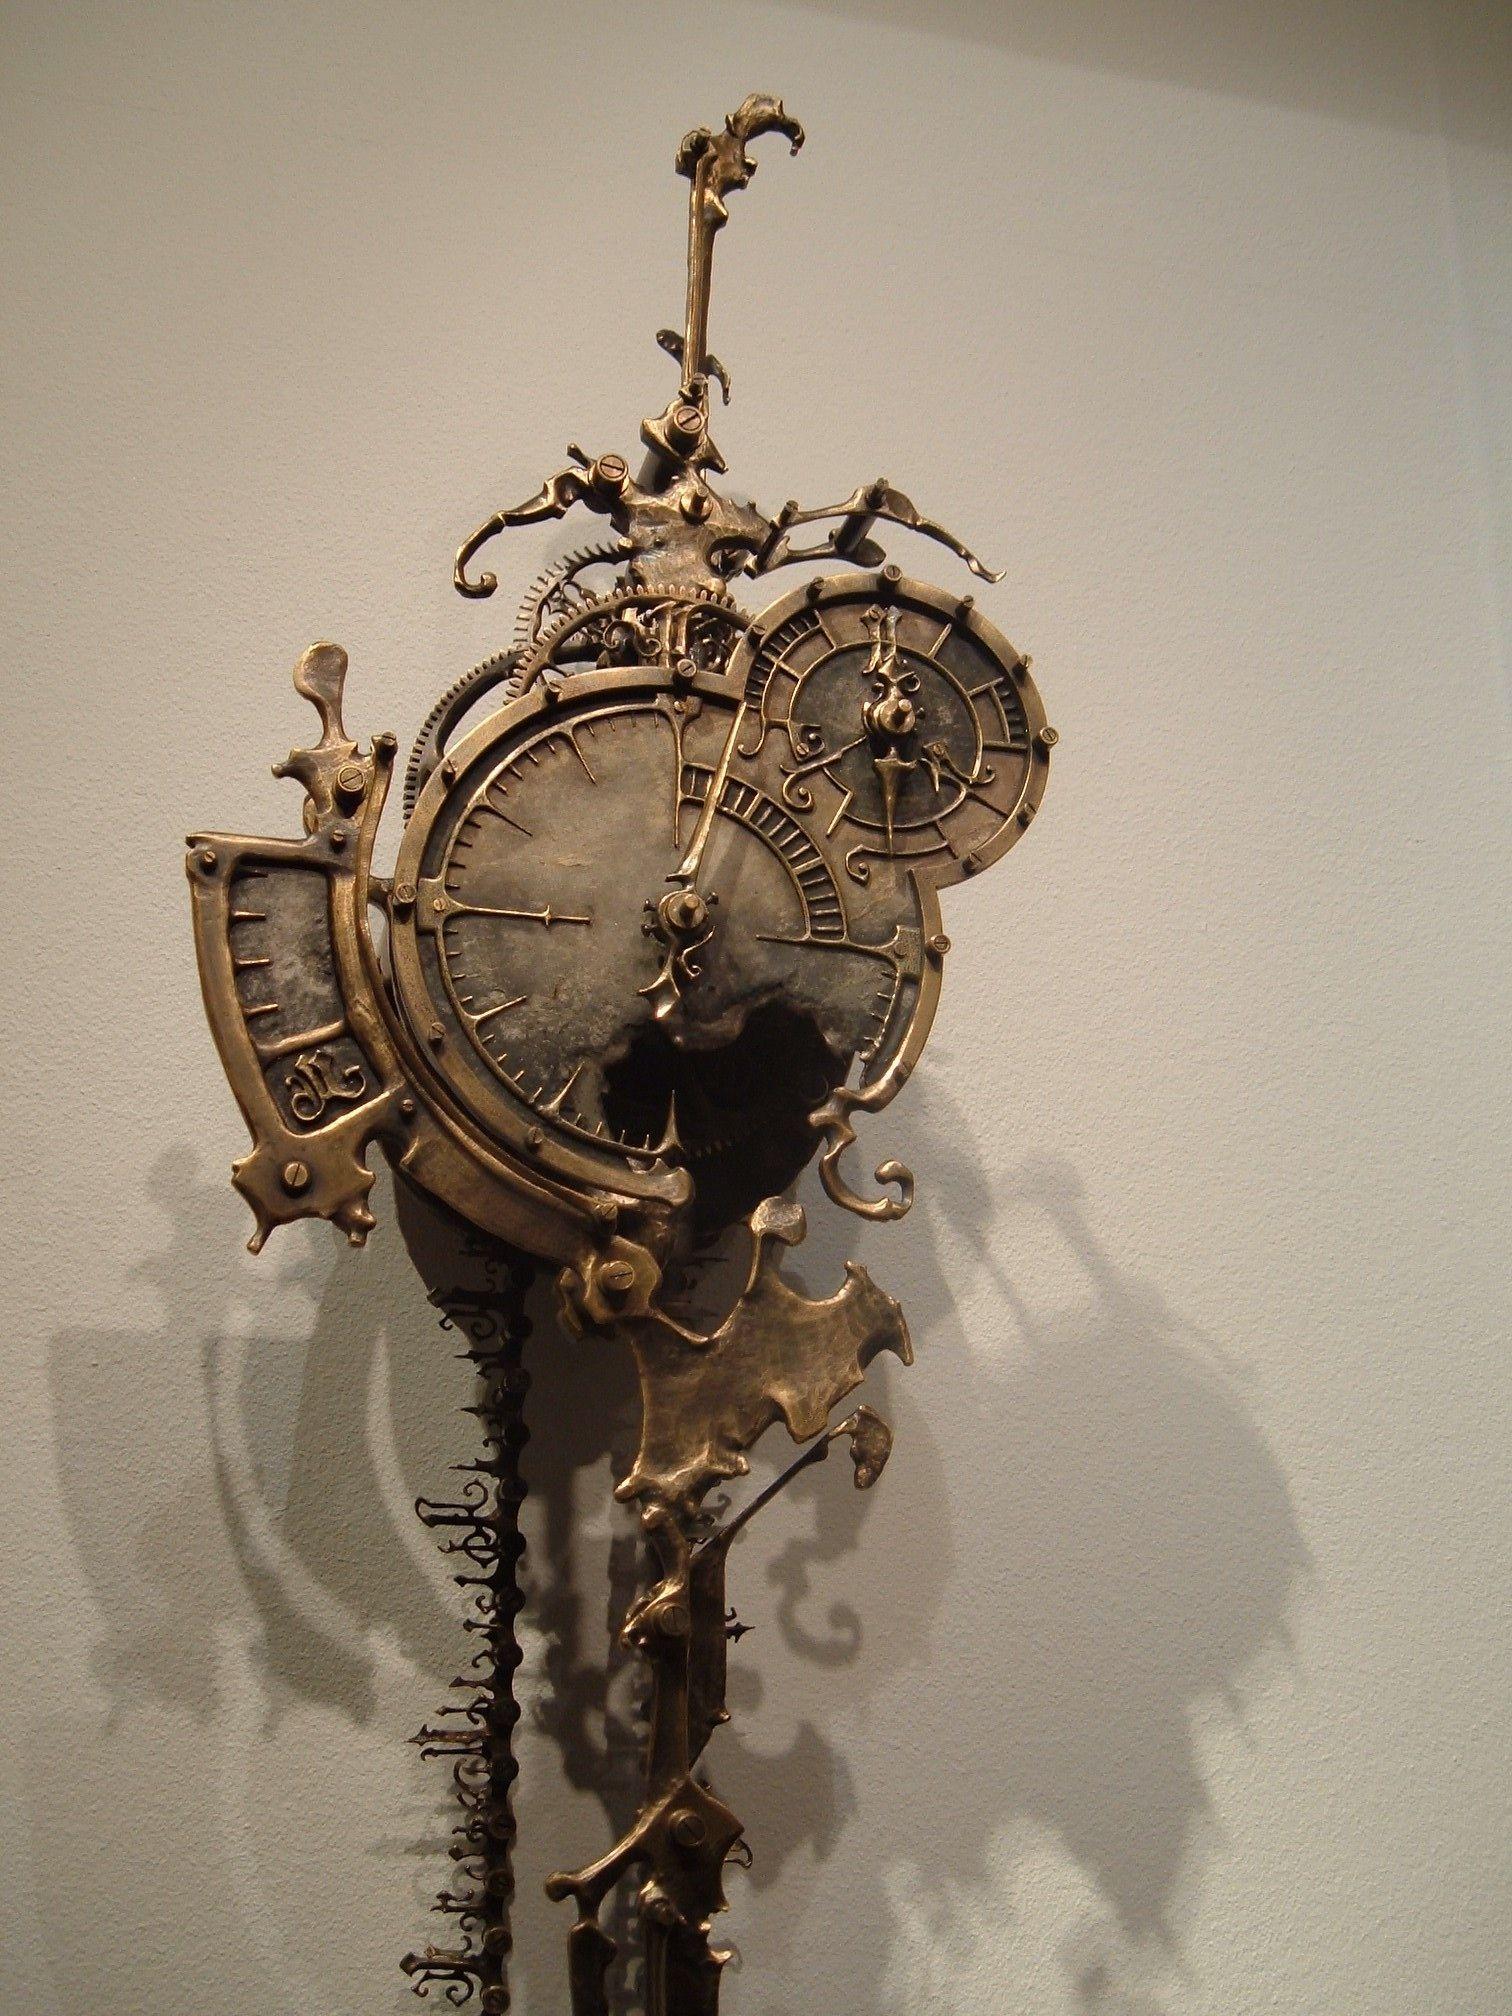 Eric Freitas Mechanical Clock At Steampunk Exhibition